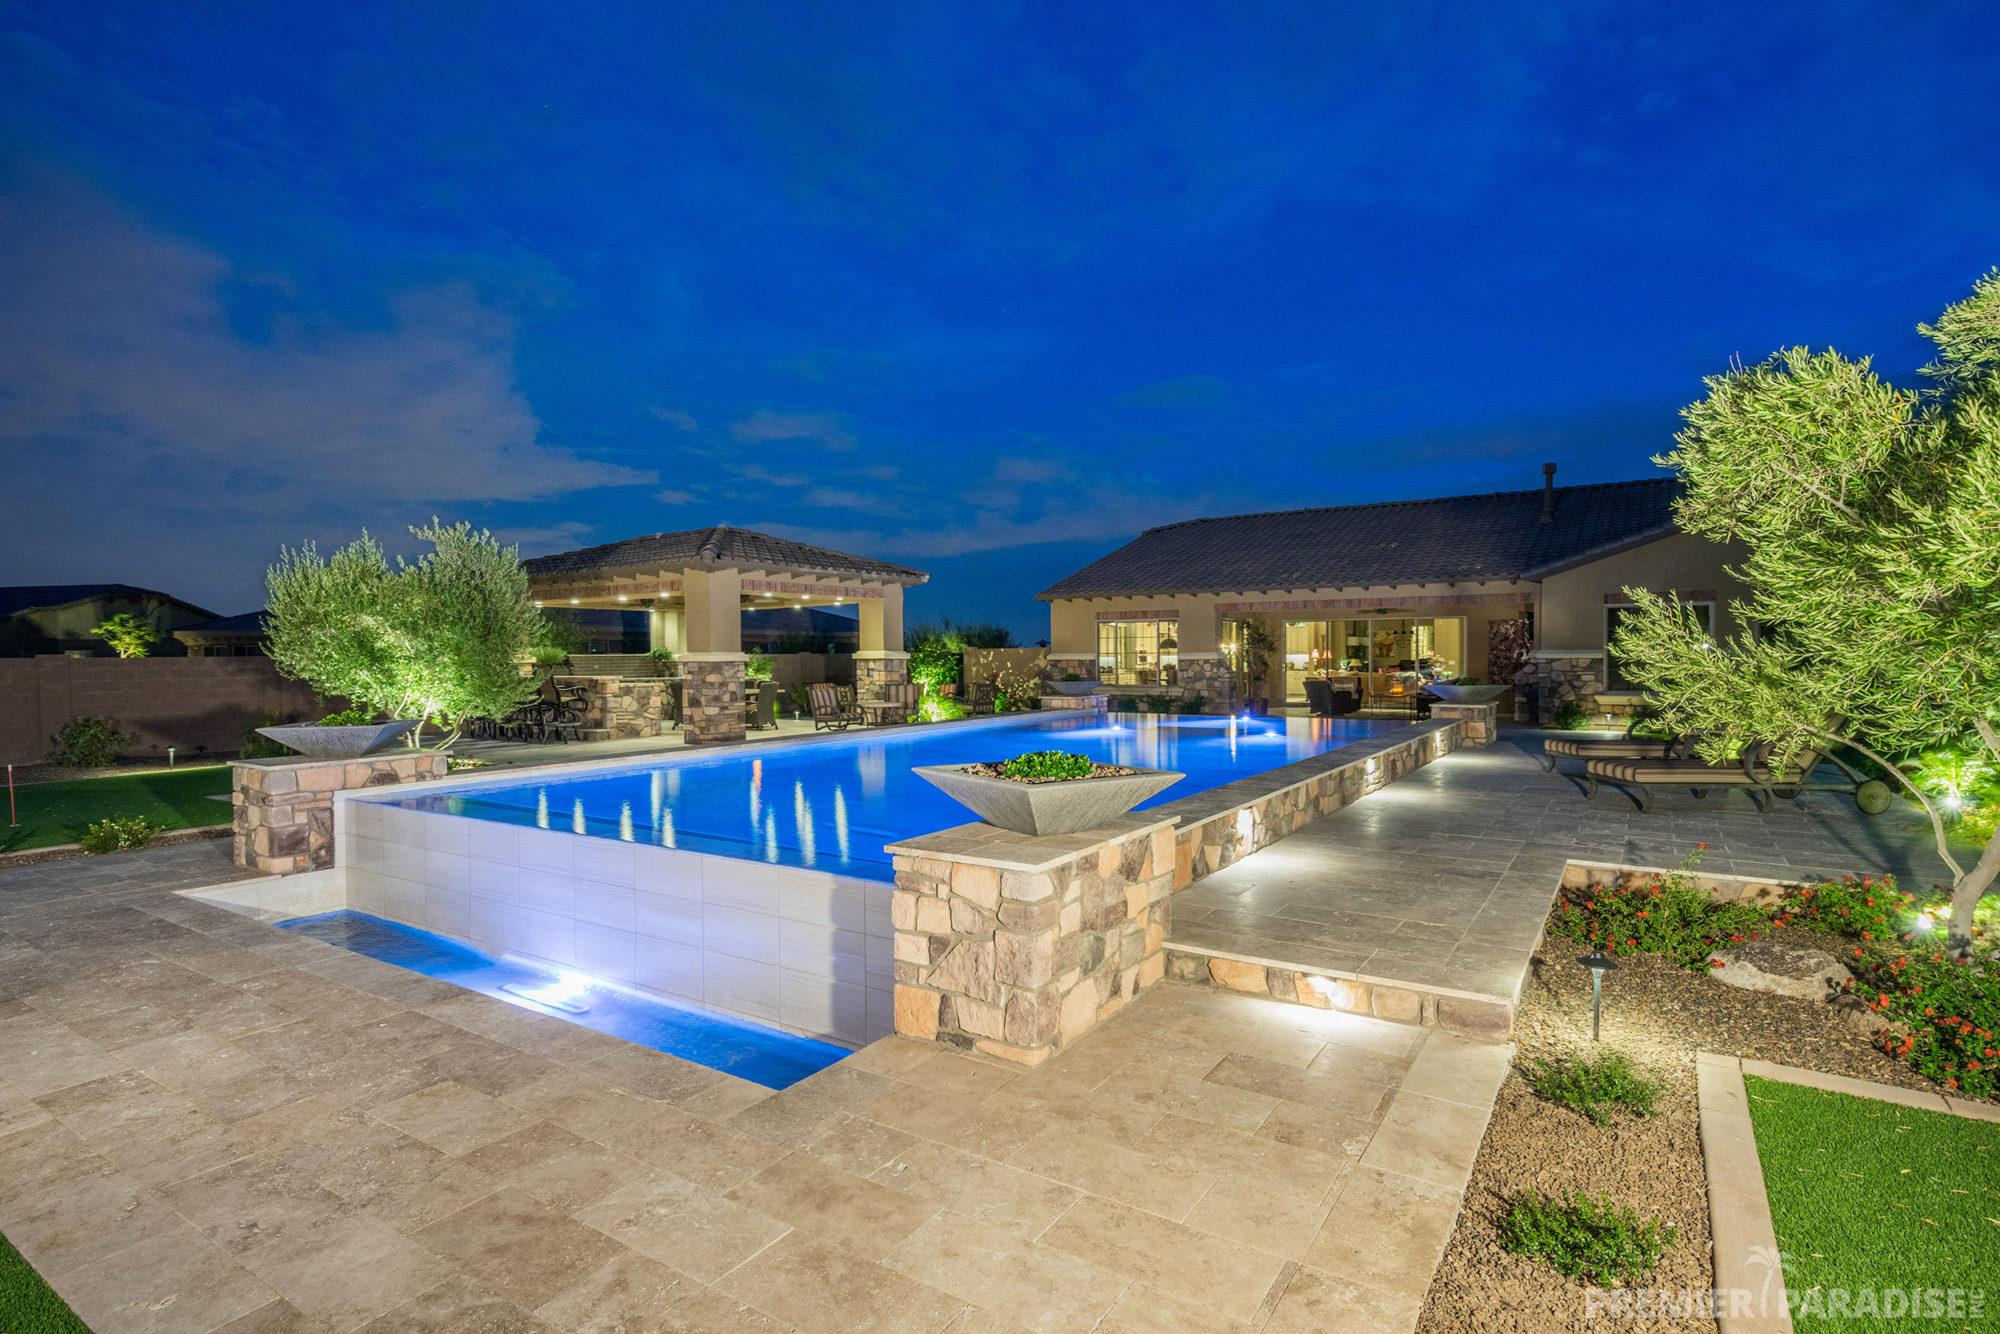 2016 Luxury Backyard Design Trends & 2015 Backyard of the